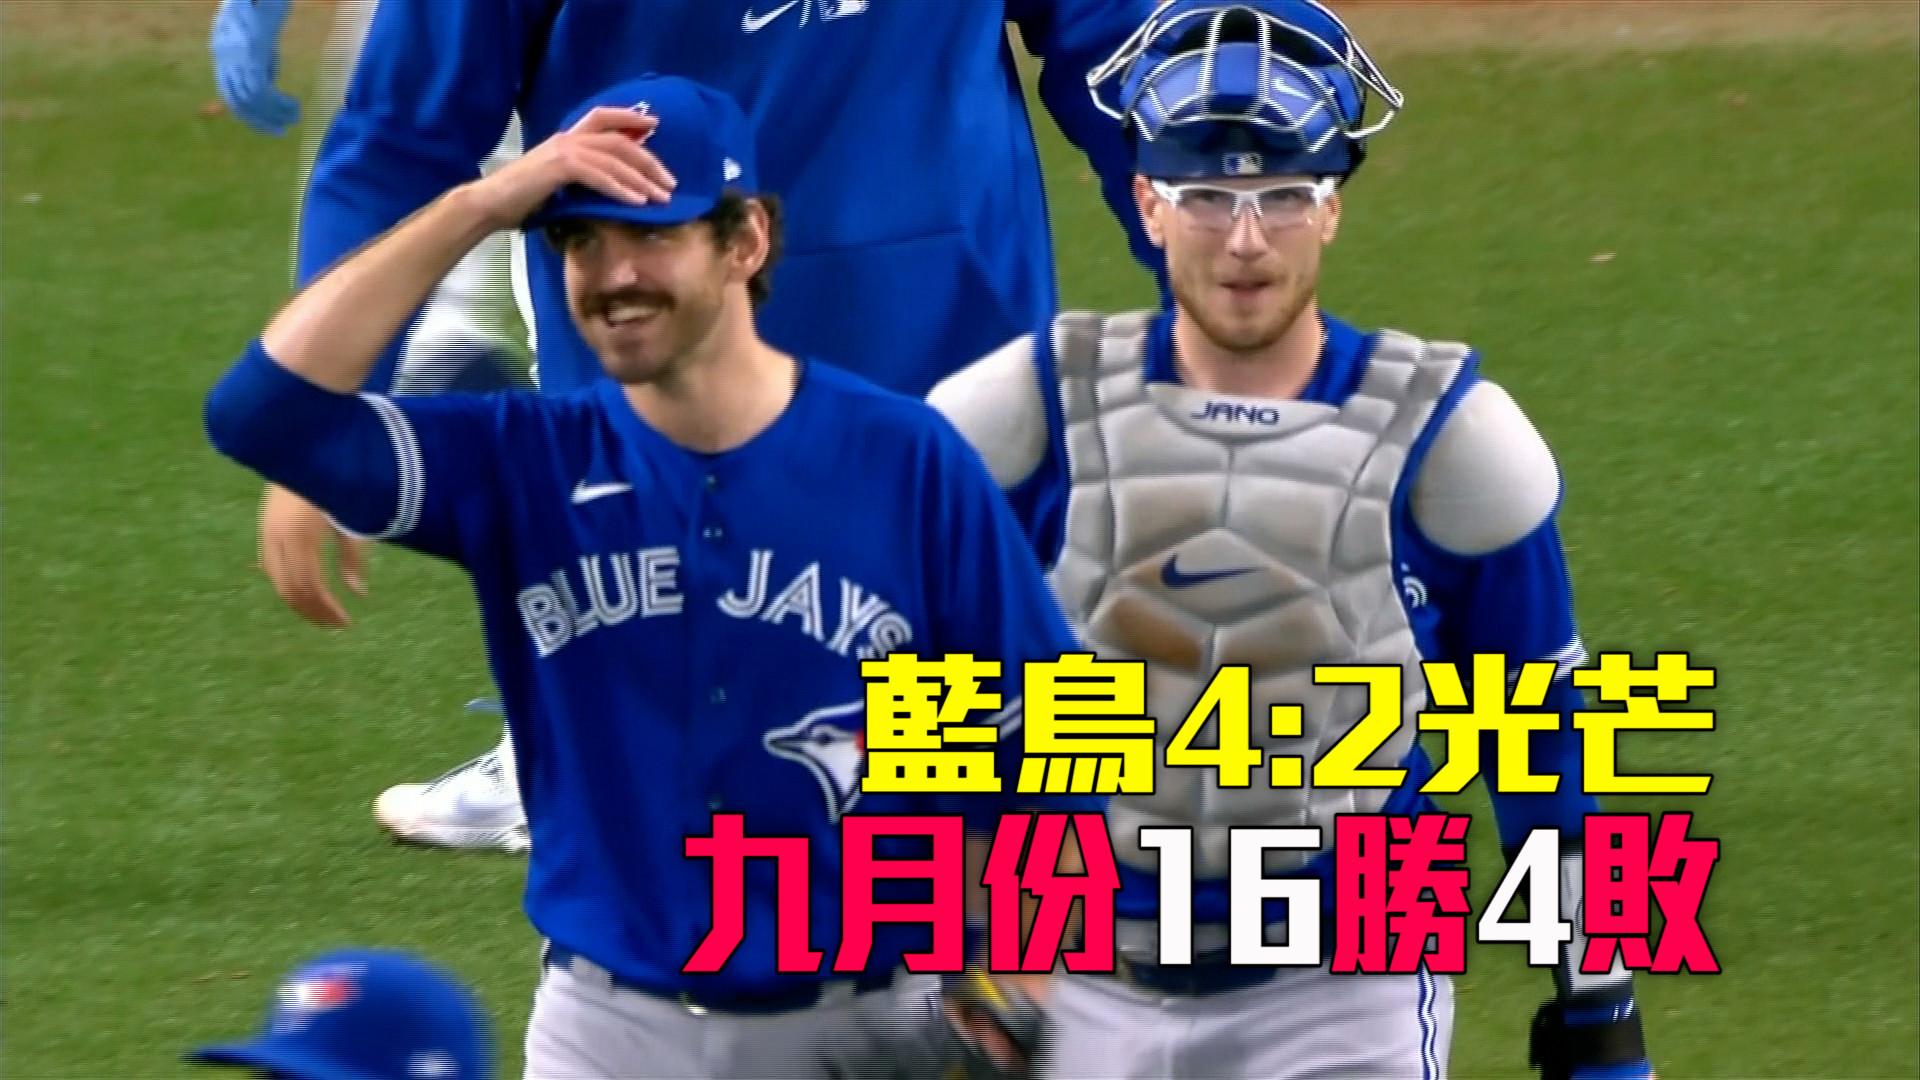 【MLB看愛爾達】藍鳥4:2光芒 九月戰績16勝4敗 9/22